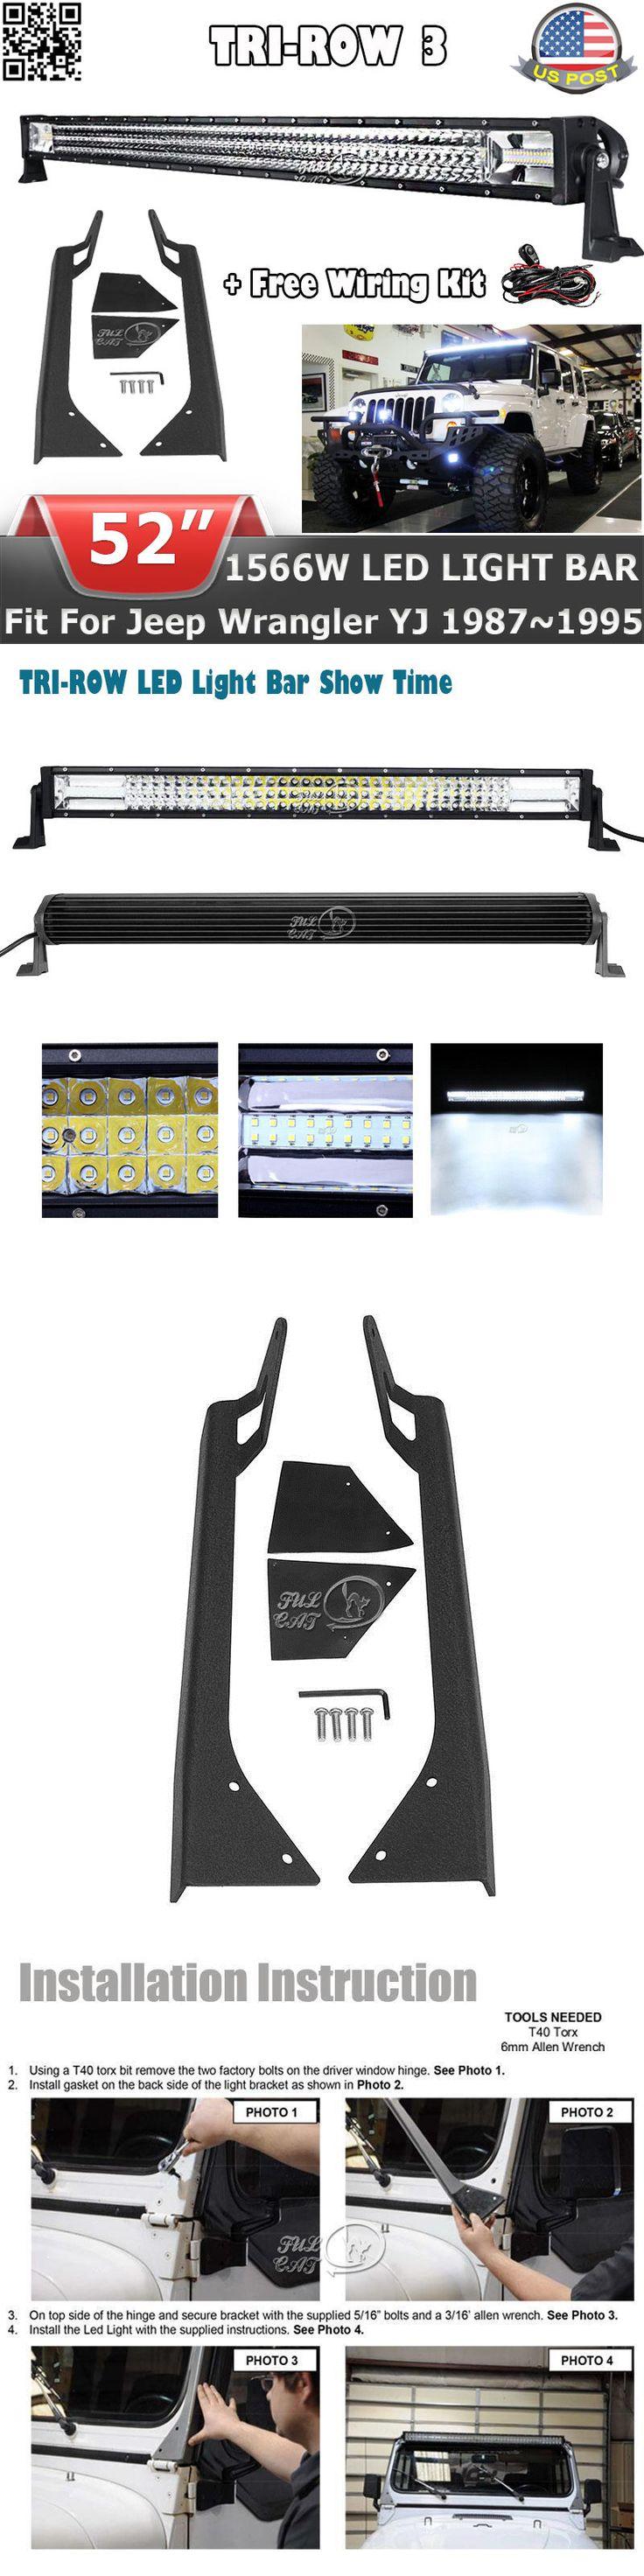 Car Lighting: Tri-Row 52 Inch 1566W Led Light Bar+Mount Bracket Fit For Jeep Wrangler Yj 87~95 -> BUY IT NOW ONLY: $179.99 on eBay!